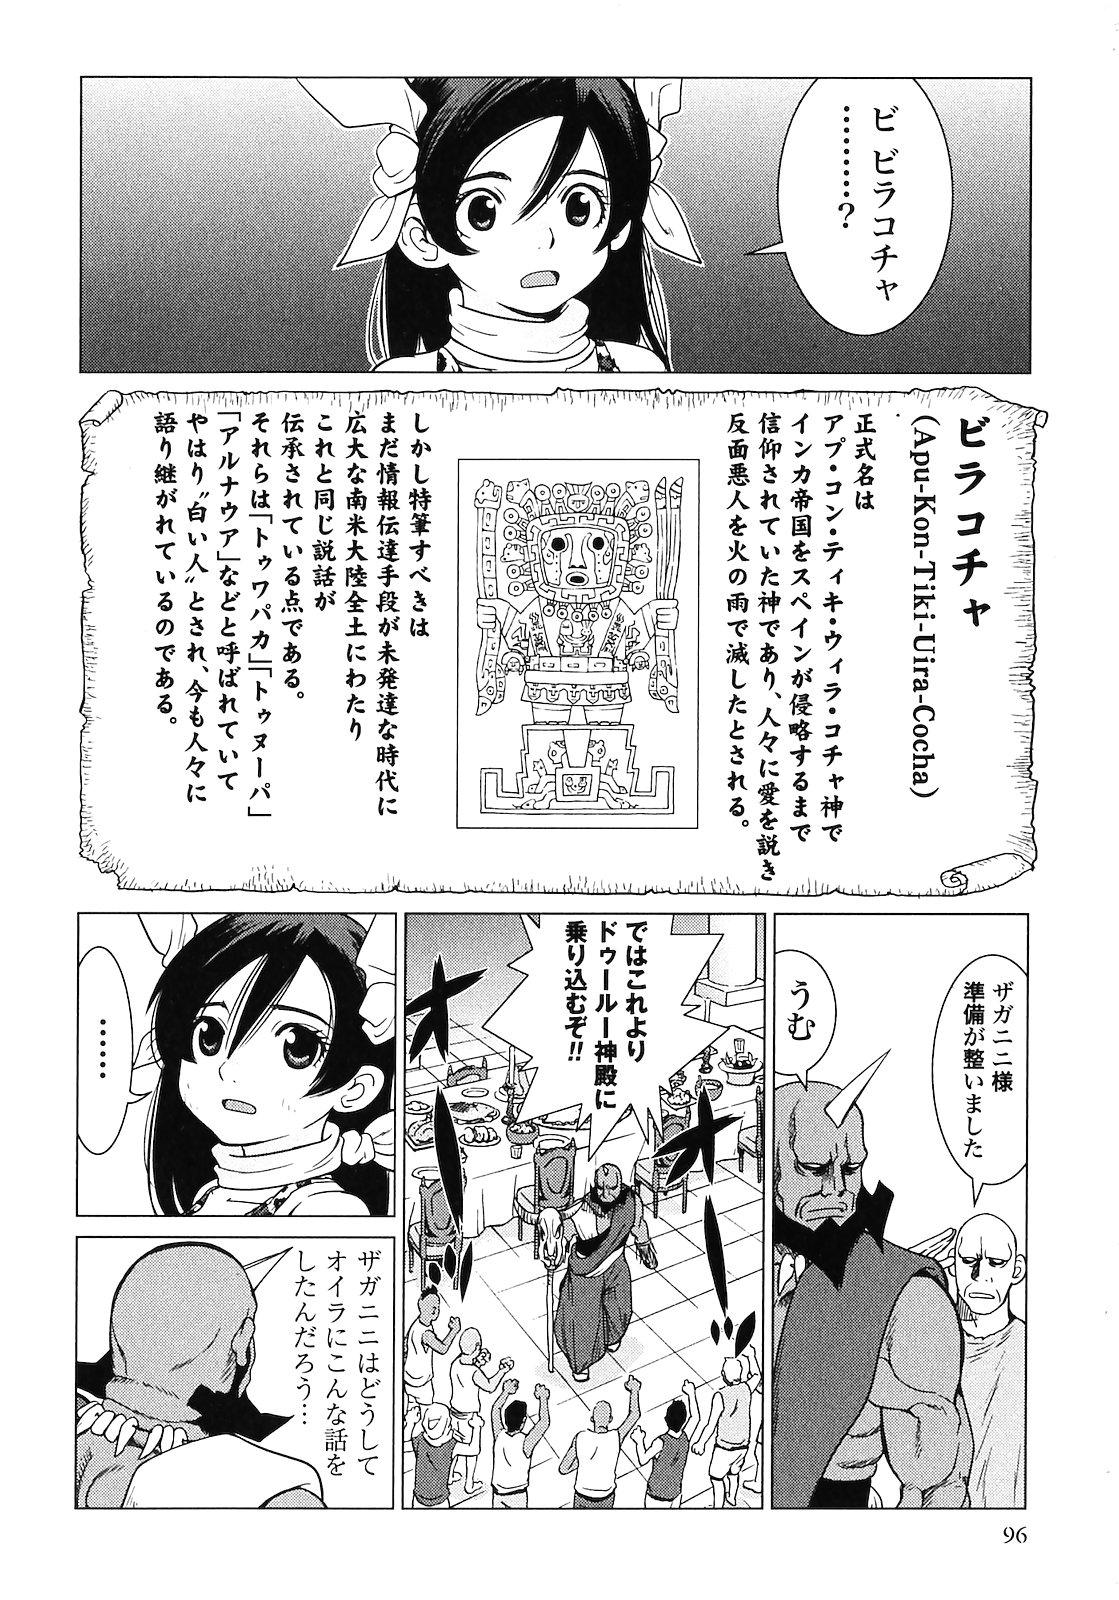 Makyo no Shanana Vol.02 97